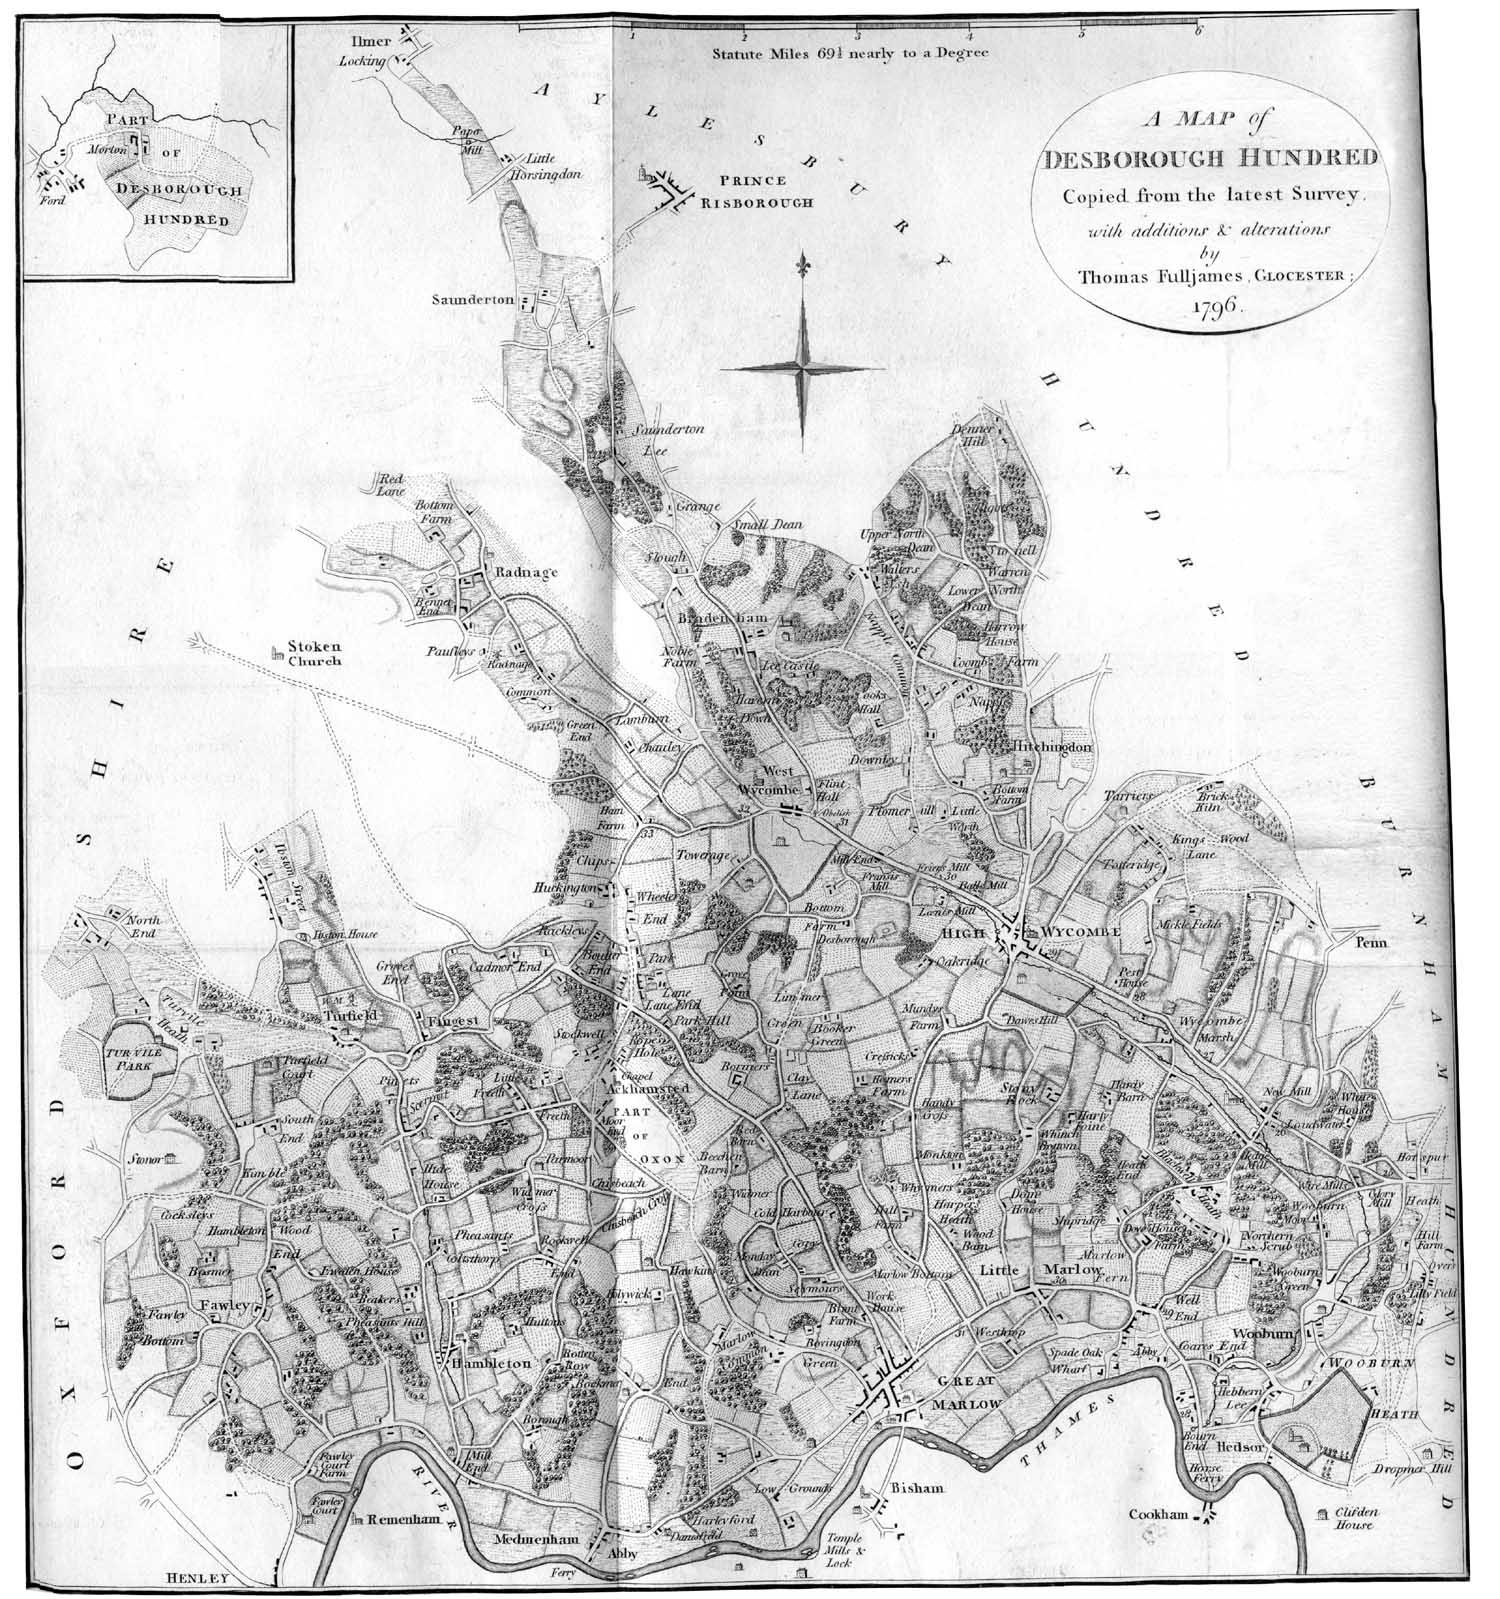 1796 Map of Desborough Hundred